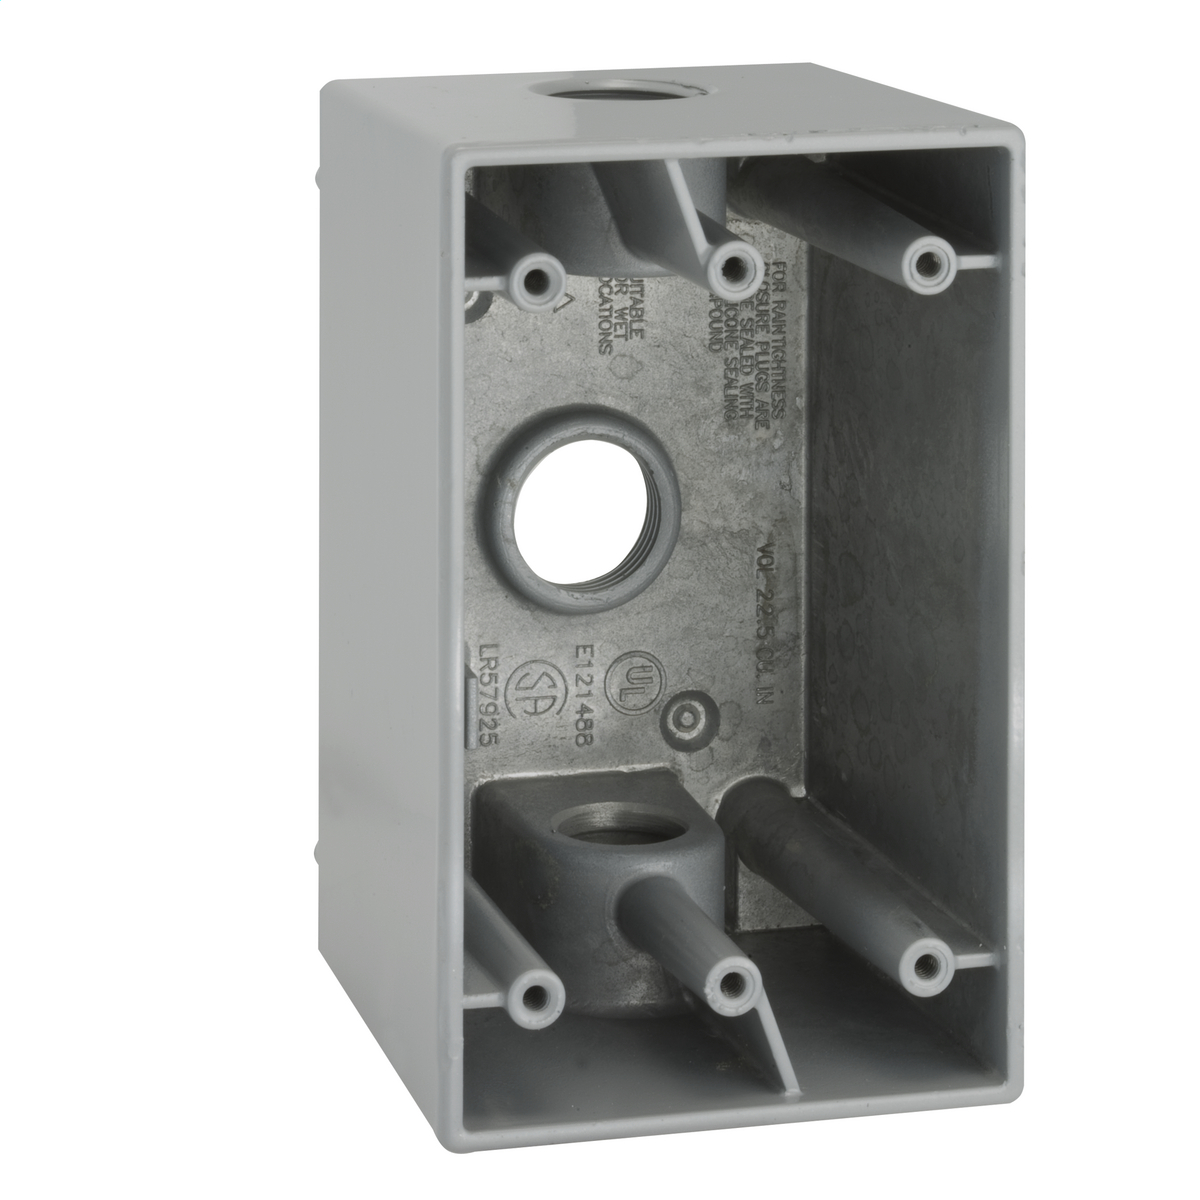 Aluminium Cast 1 Bell 5385-0 Single-Gang Weatherproof Deep Box New HUBBEL WET